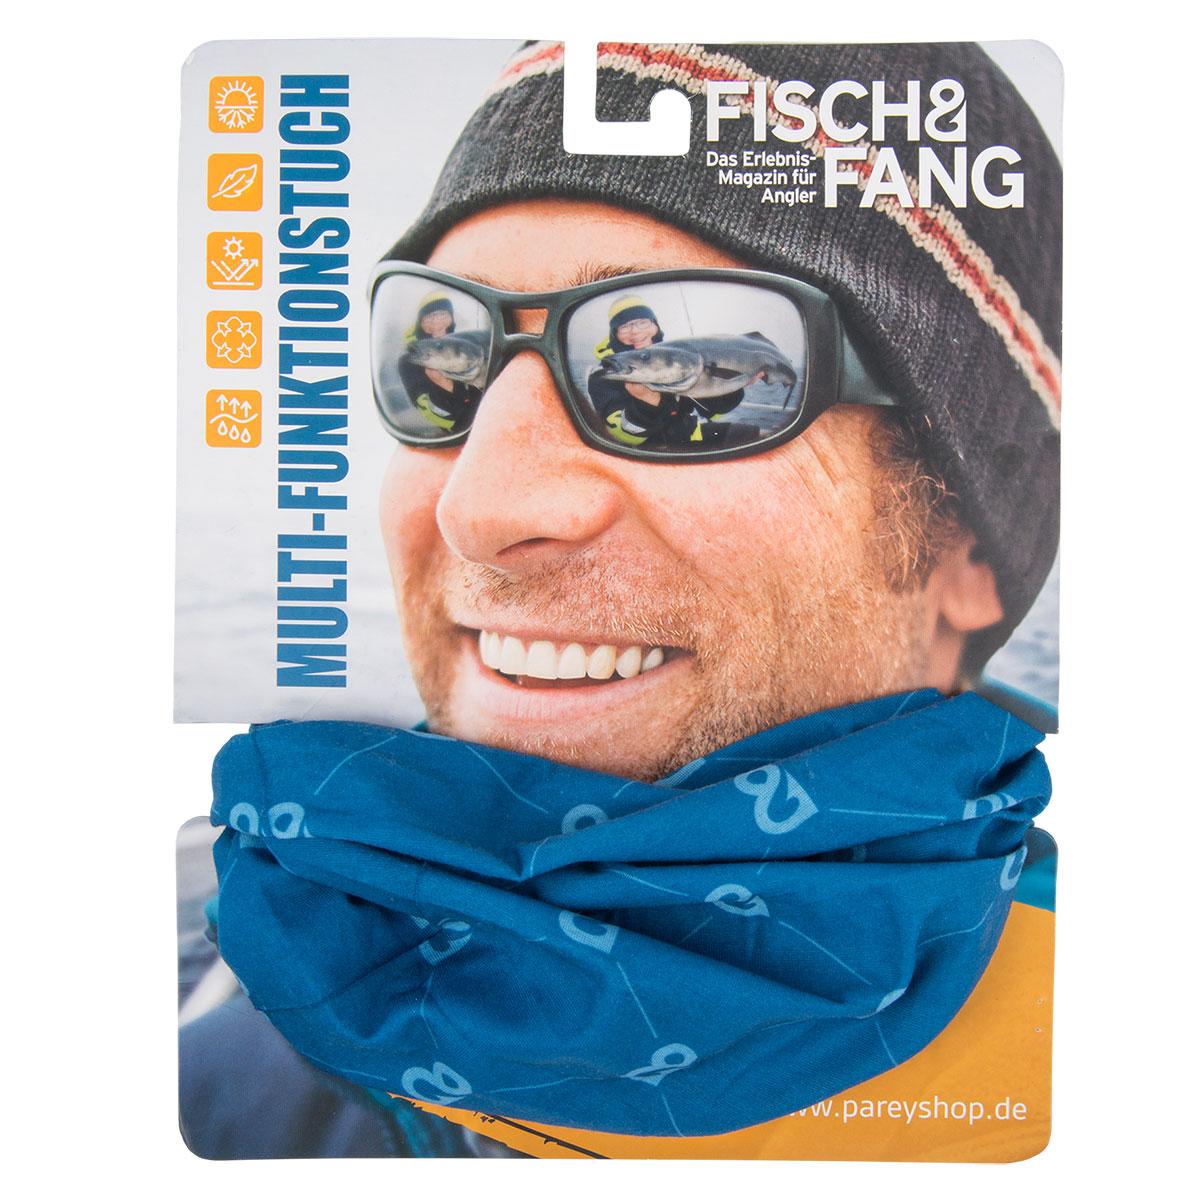 FISCH & FANG Edition: Multifunktionstuch im Pareyshop